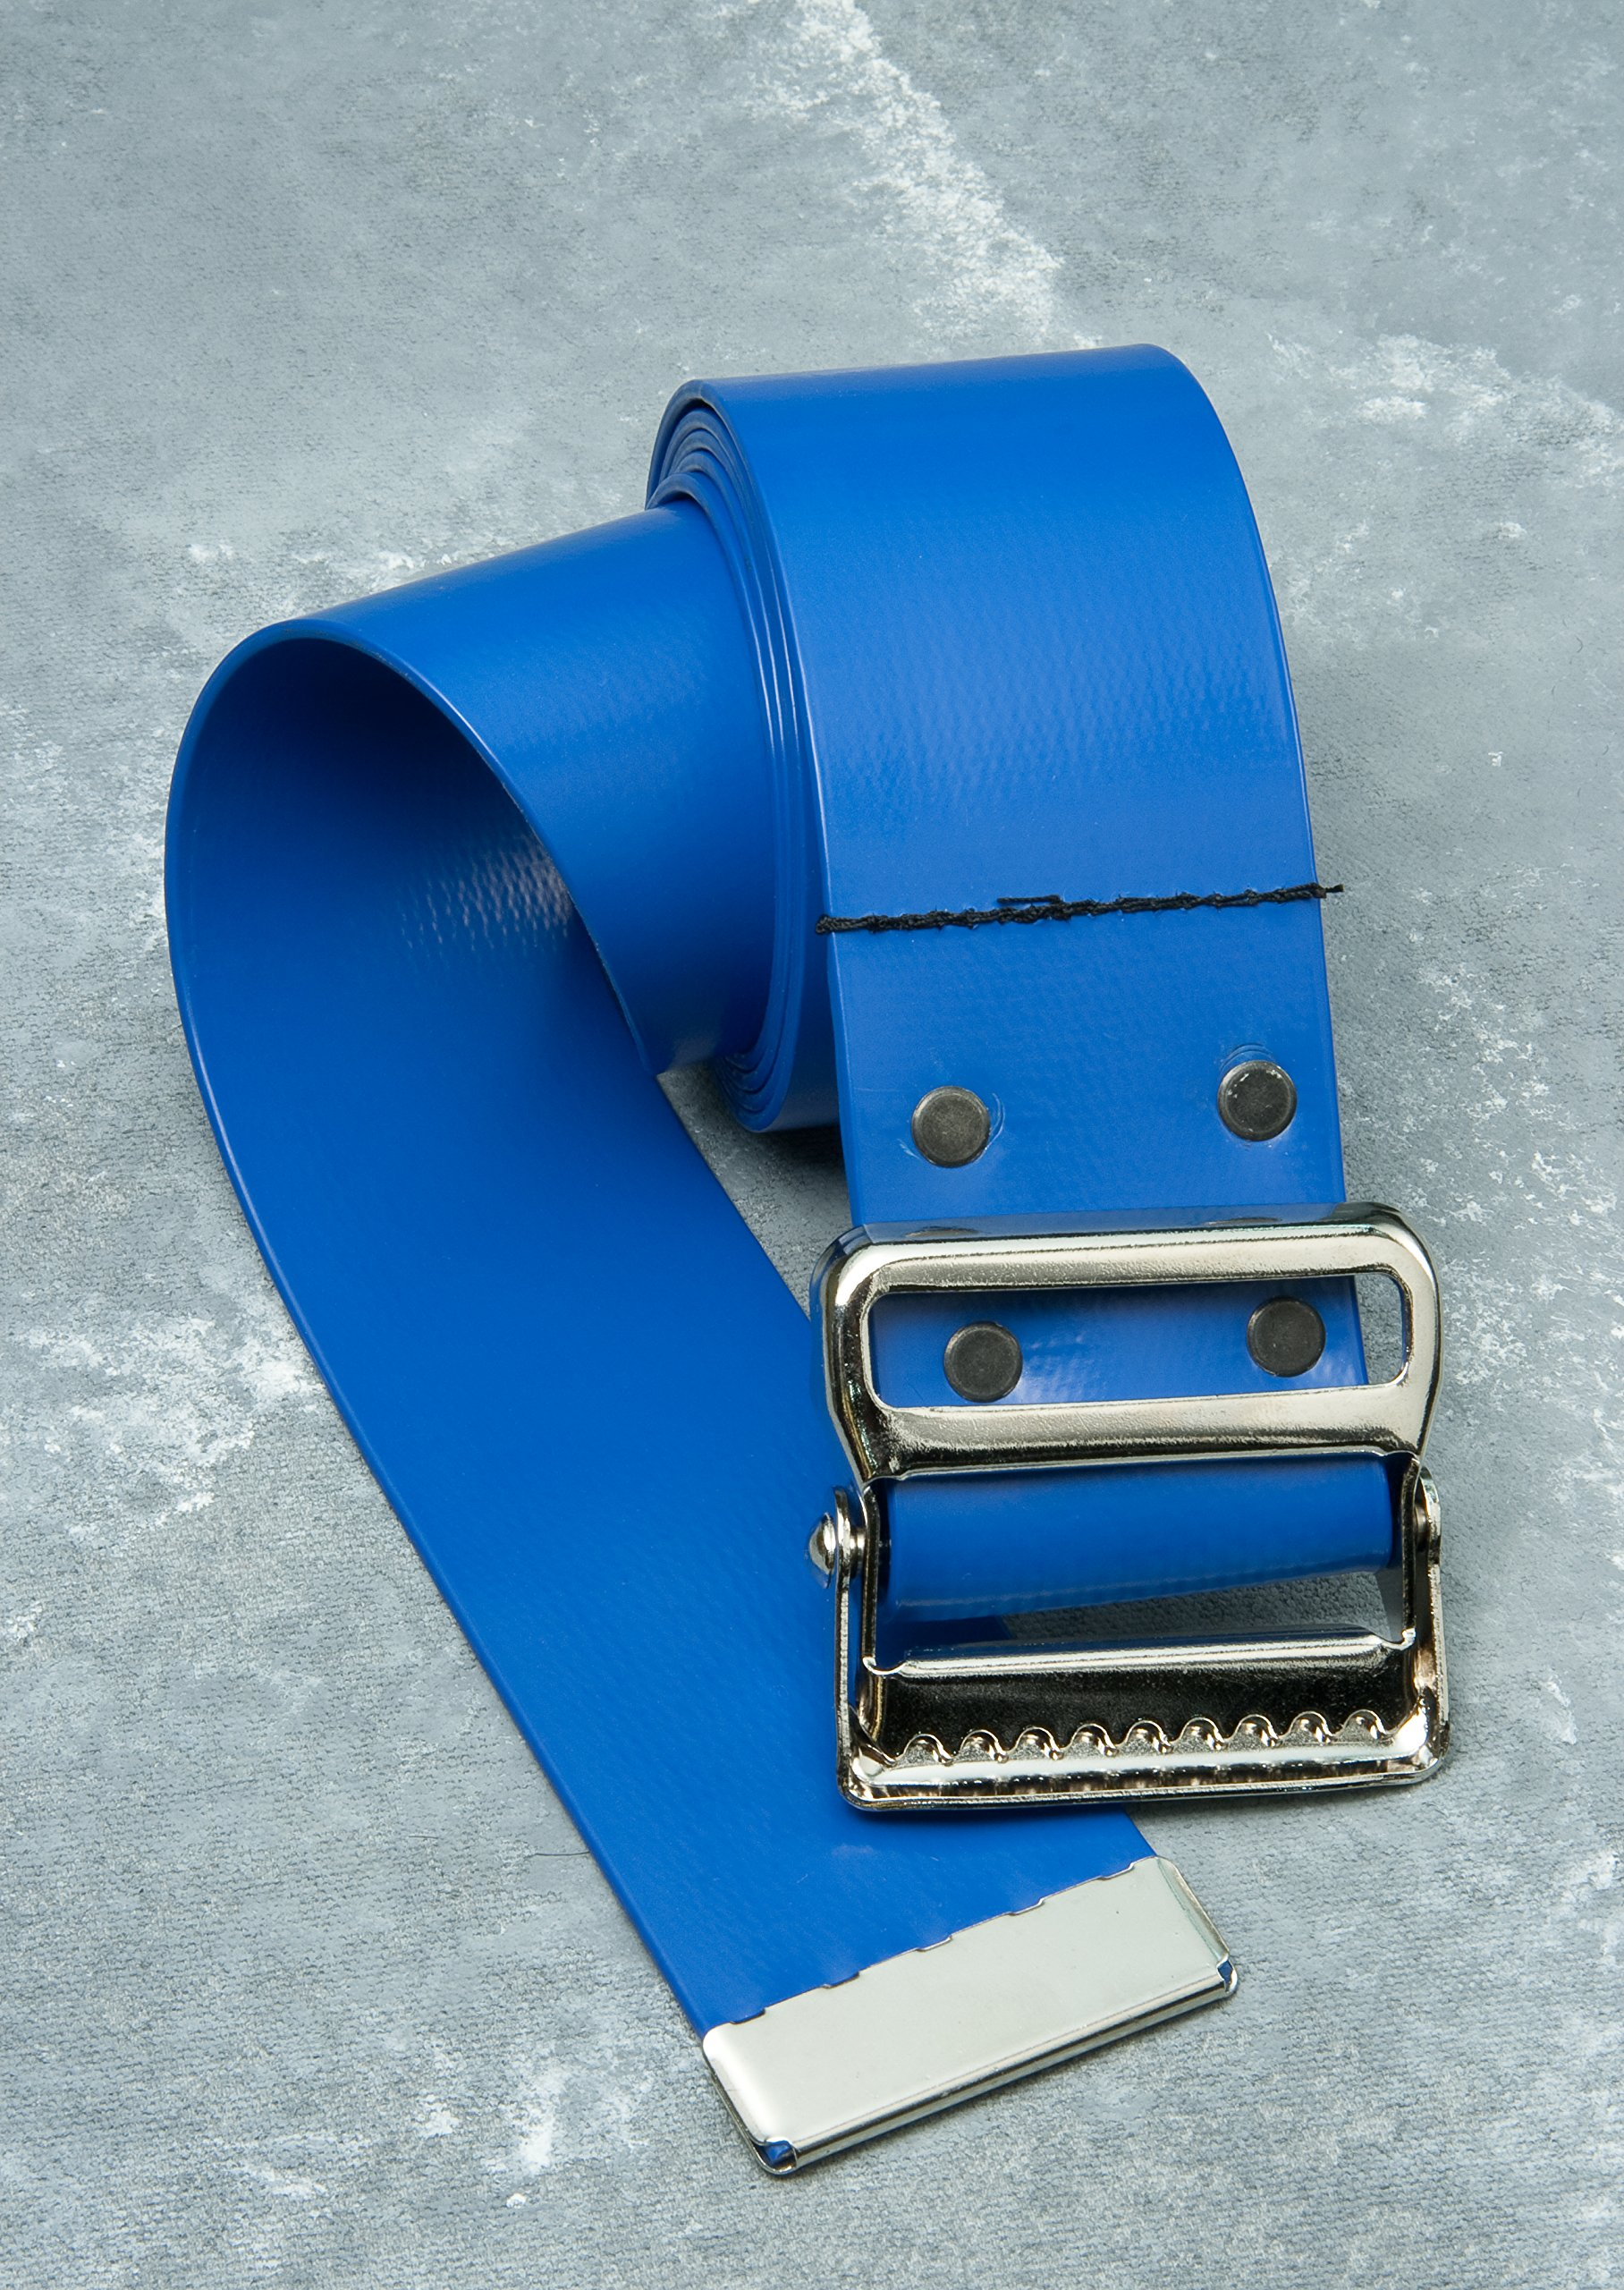 Gaitbelt.com VINYL GAIT BELT (60'', VINYL-BLUE) by Gaitbeltcom